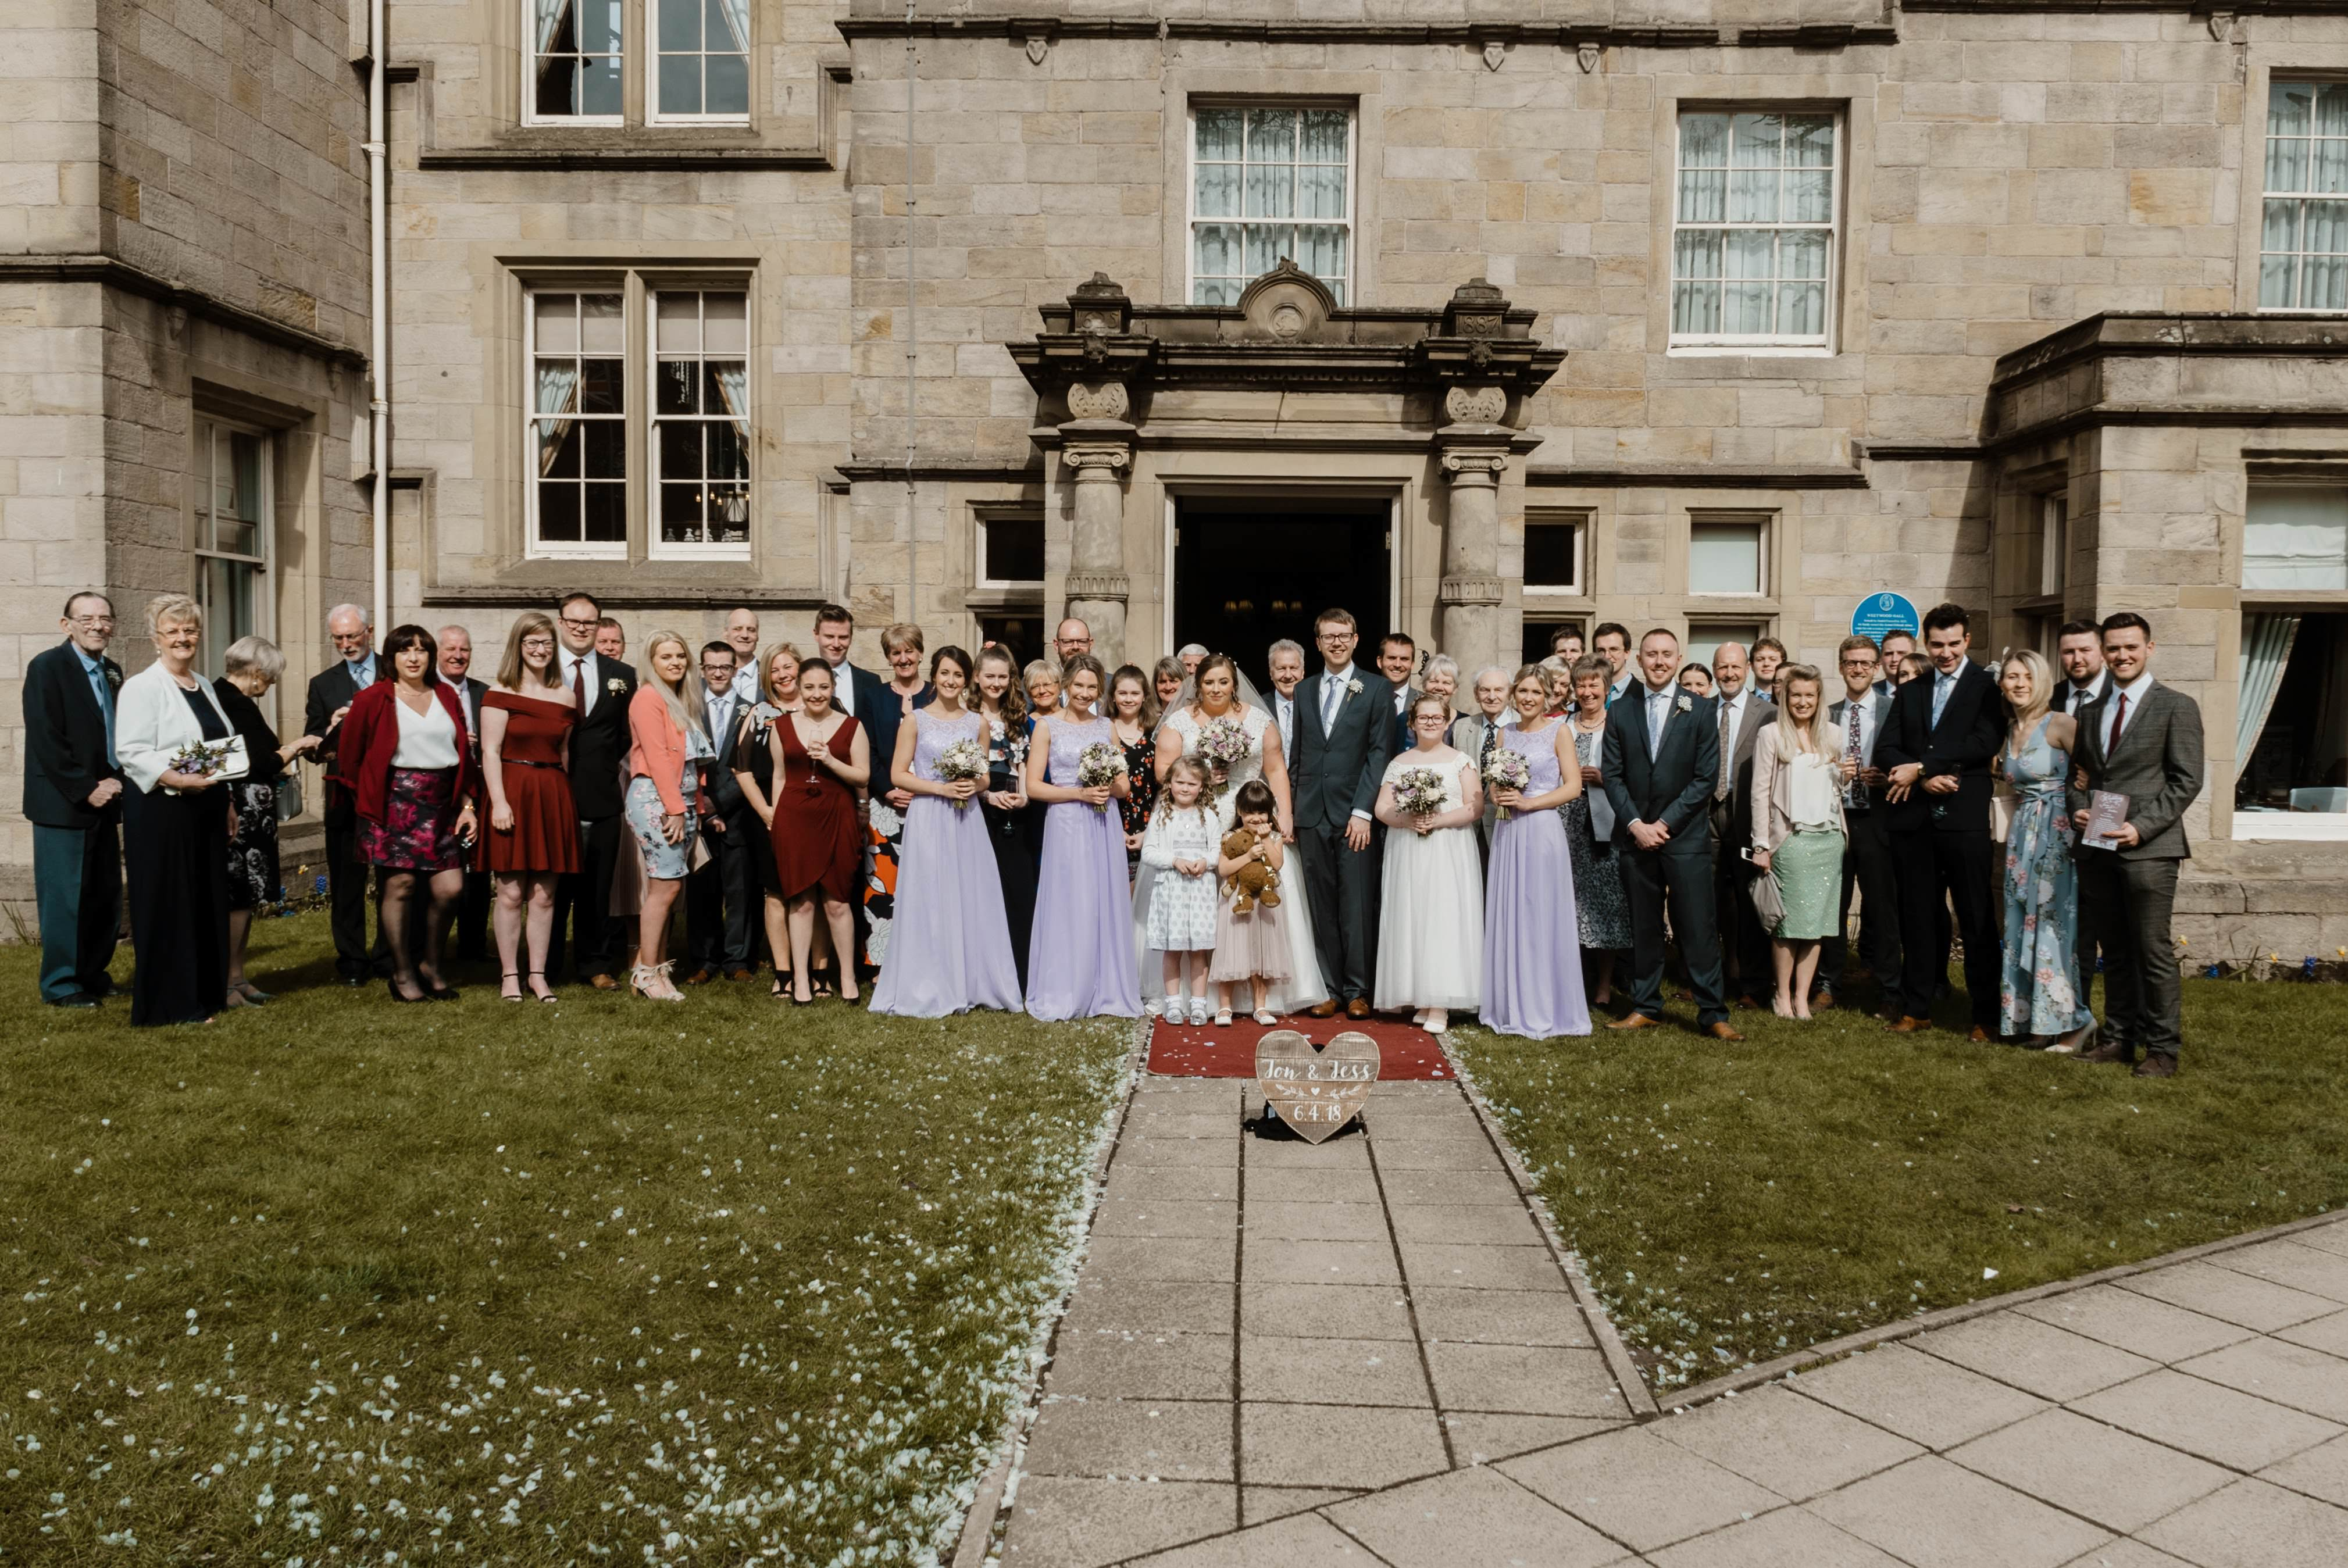 Weetwood Hall Wedding Leeds 5 - Sneak Peek - Jessica & Jonathan  Weetwood Hall Wedding Leeds